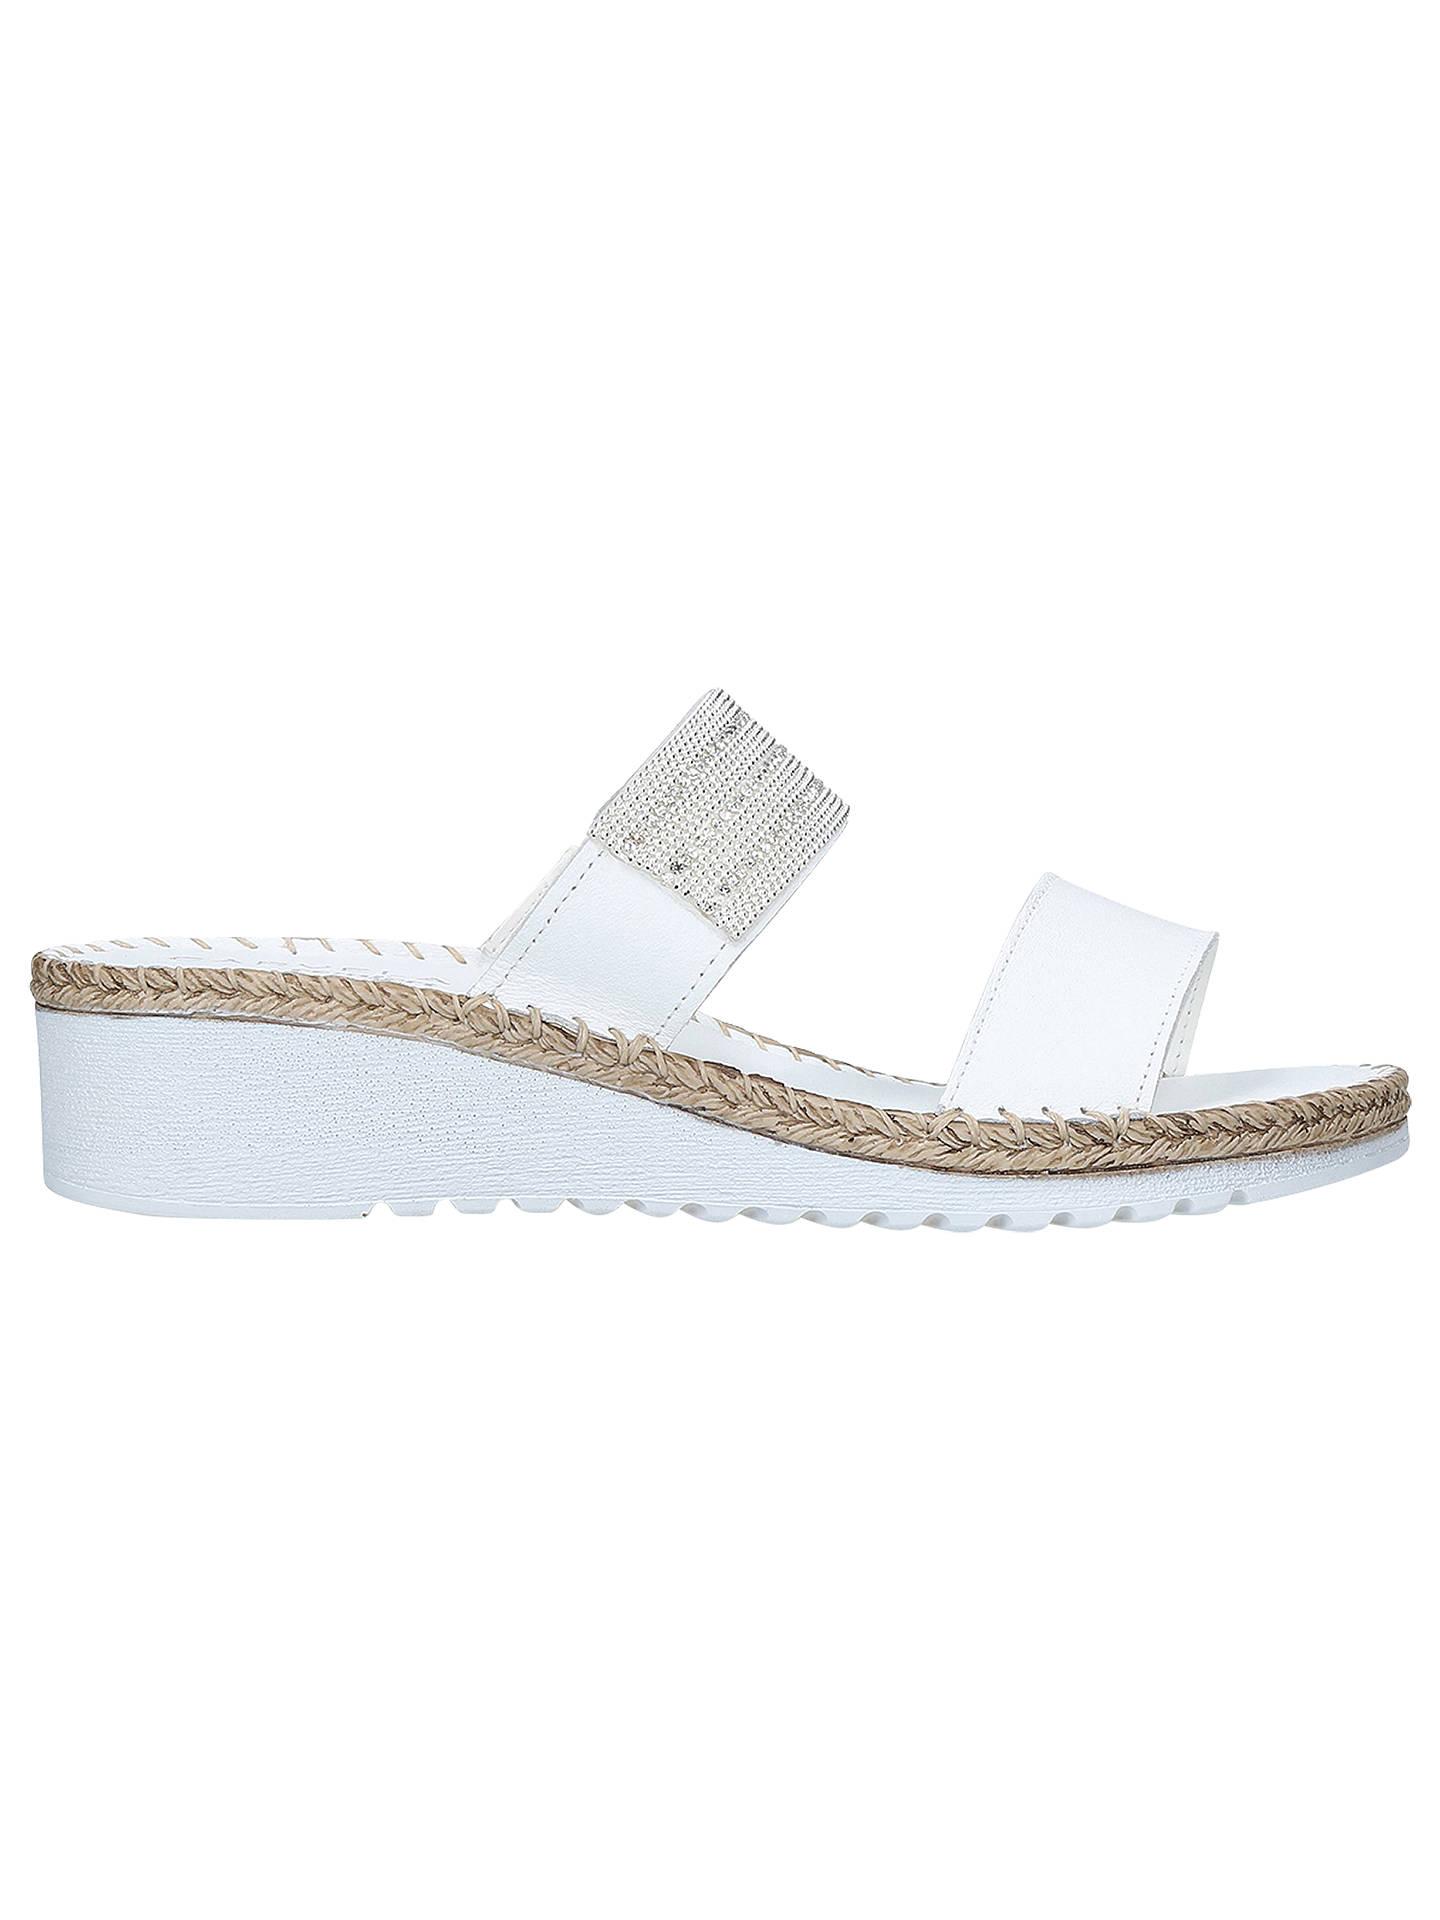 04b29aa7d Buy Carvela Comfort Sash Open Toe Sandals